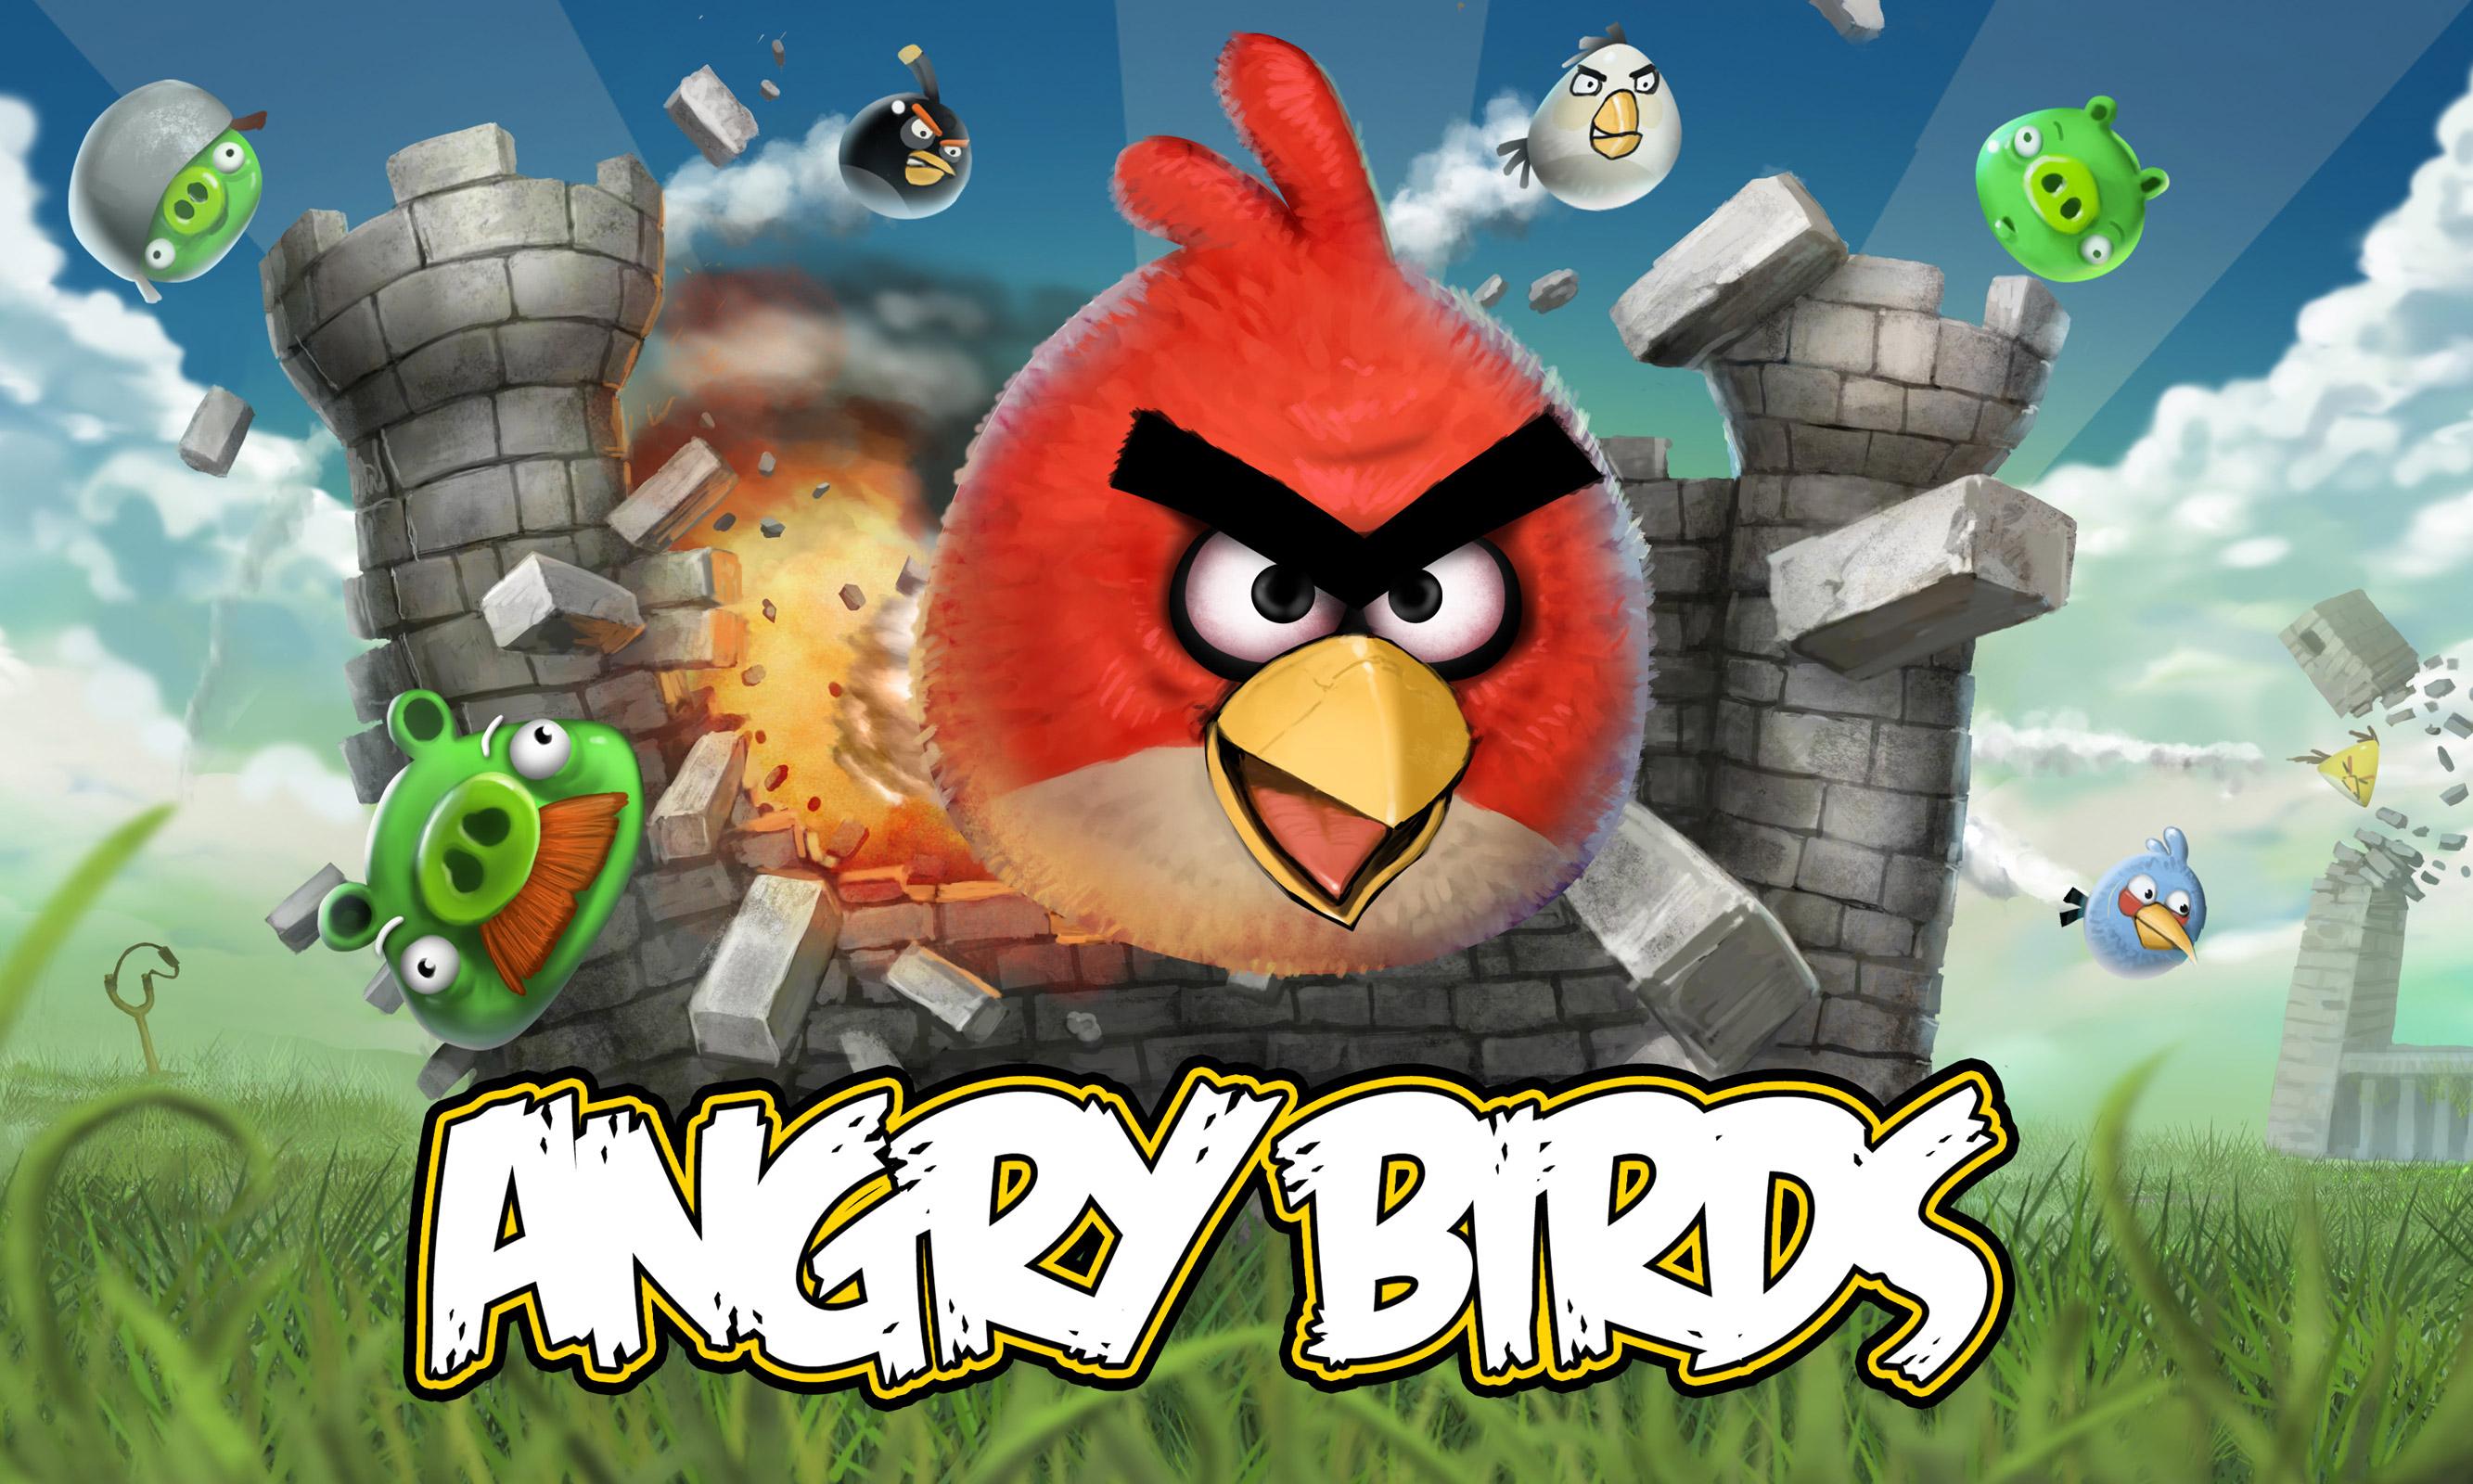 Angry Birds Desktop Wallpapers  Angrybirdsnest